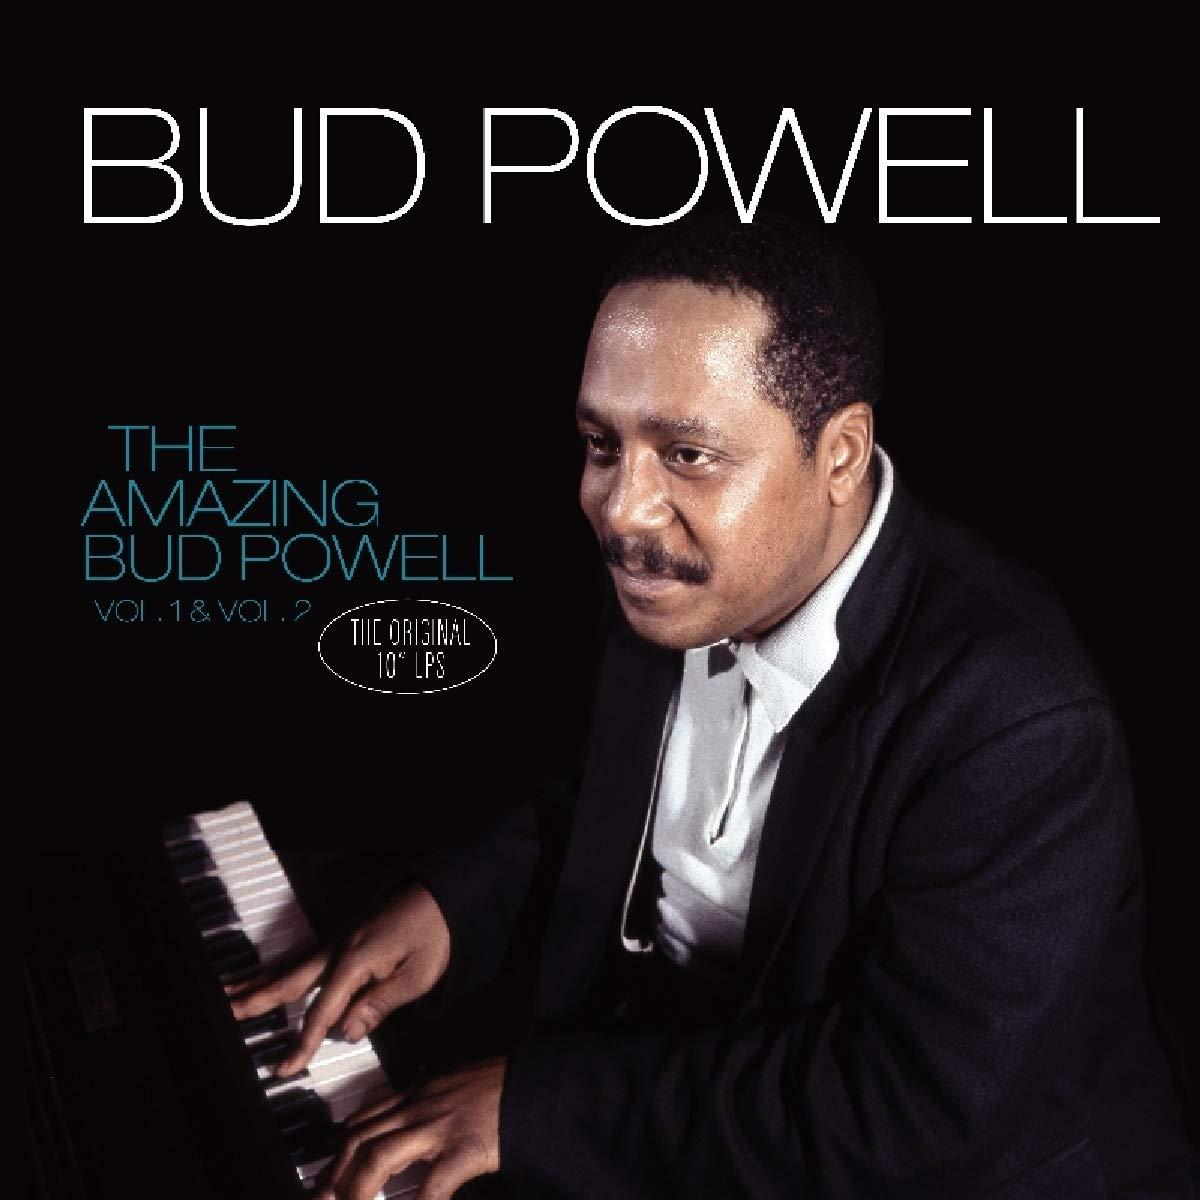 Bud Powell - Amazing Bud Powell Vol 1 & 2